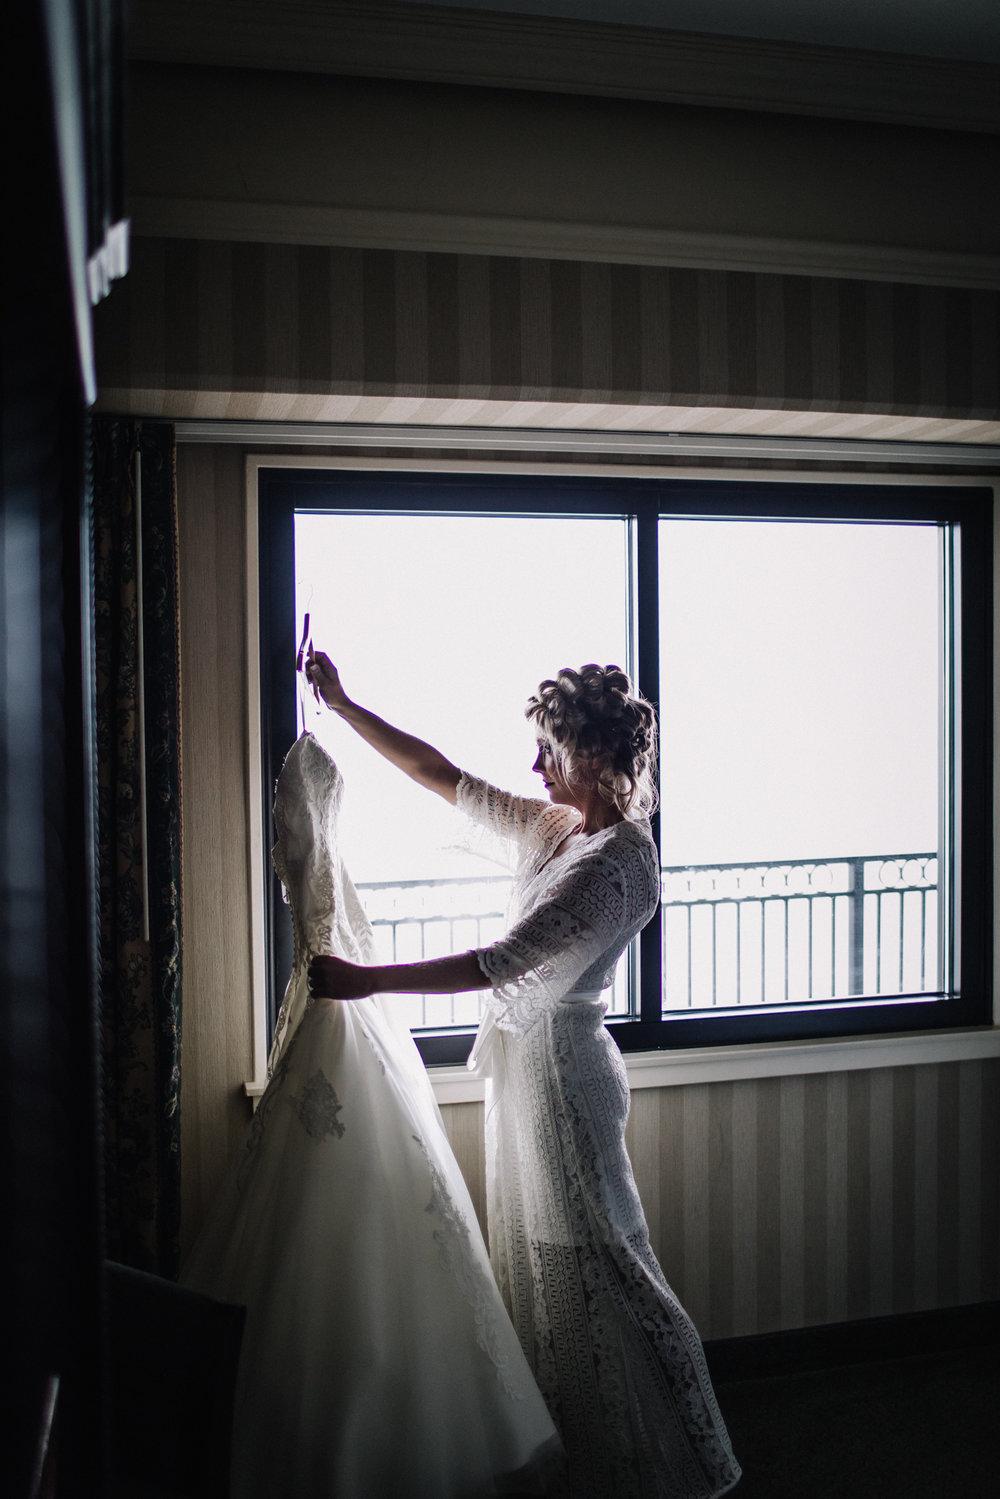 billie-shaye-style-photography-www.billieshayestyle.com-fall-city-wedding-louisville-kentucky-3585.jpg